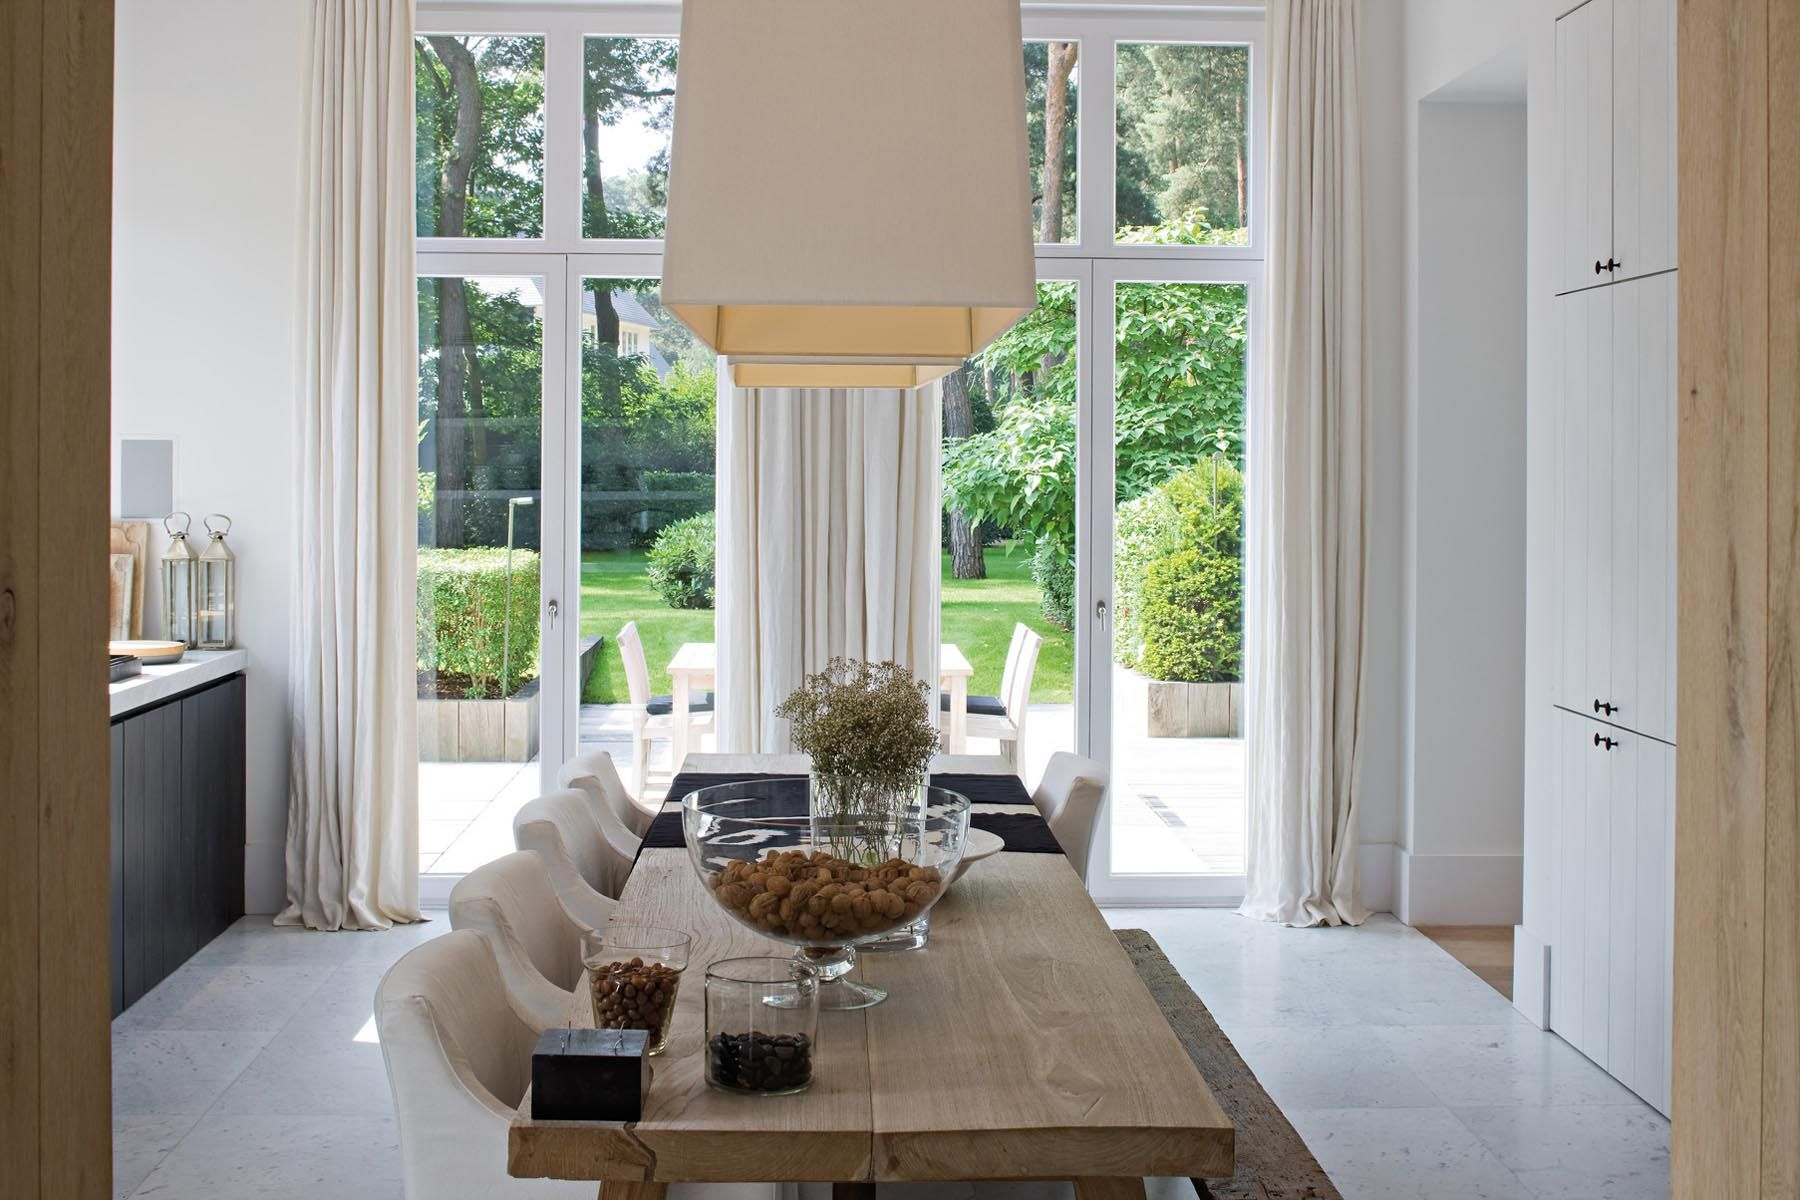 Traditional Meets Modern Interieurarchitectuur Huis Interieur